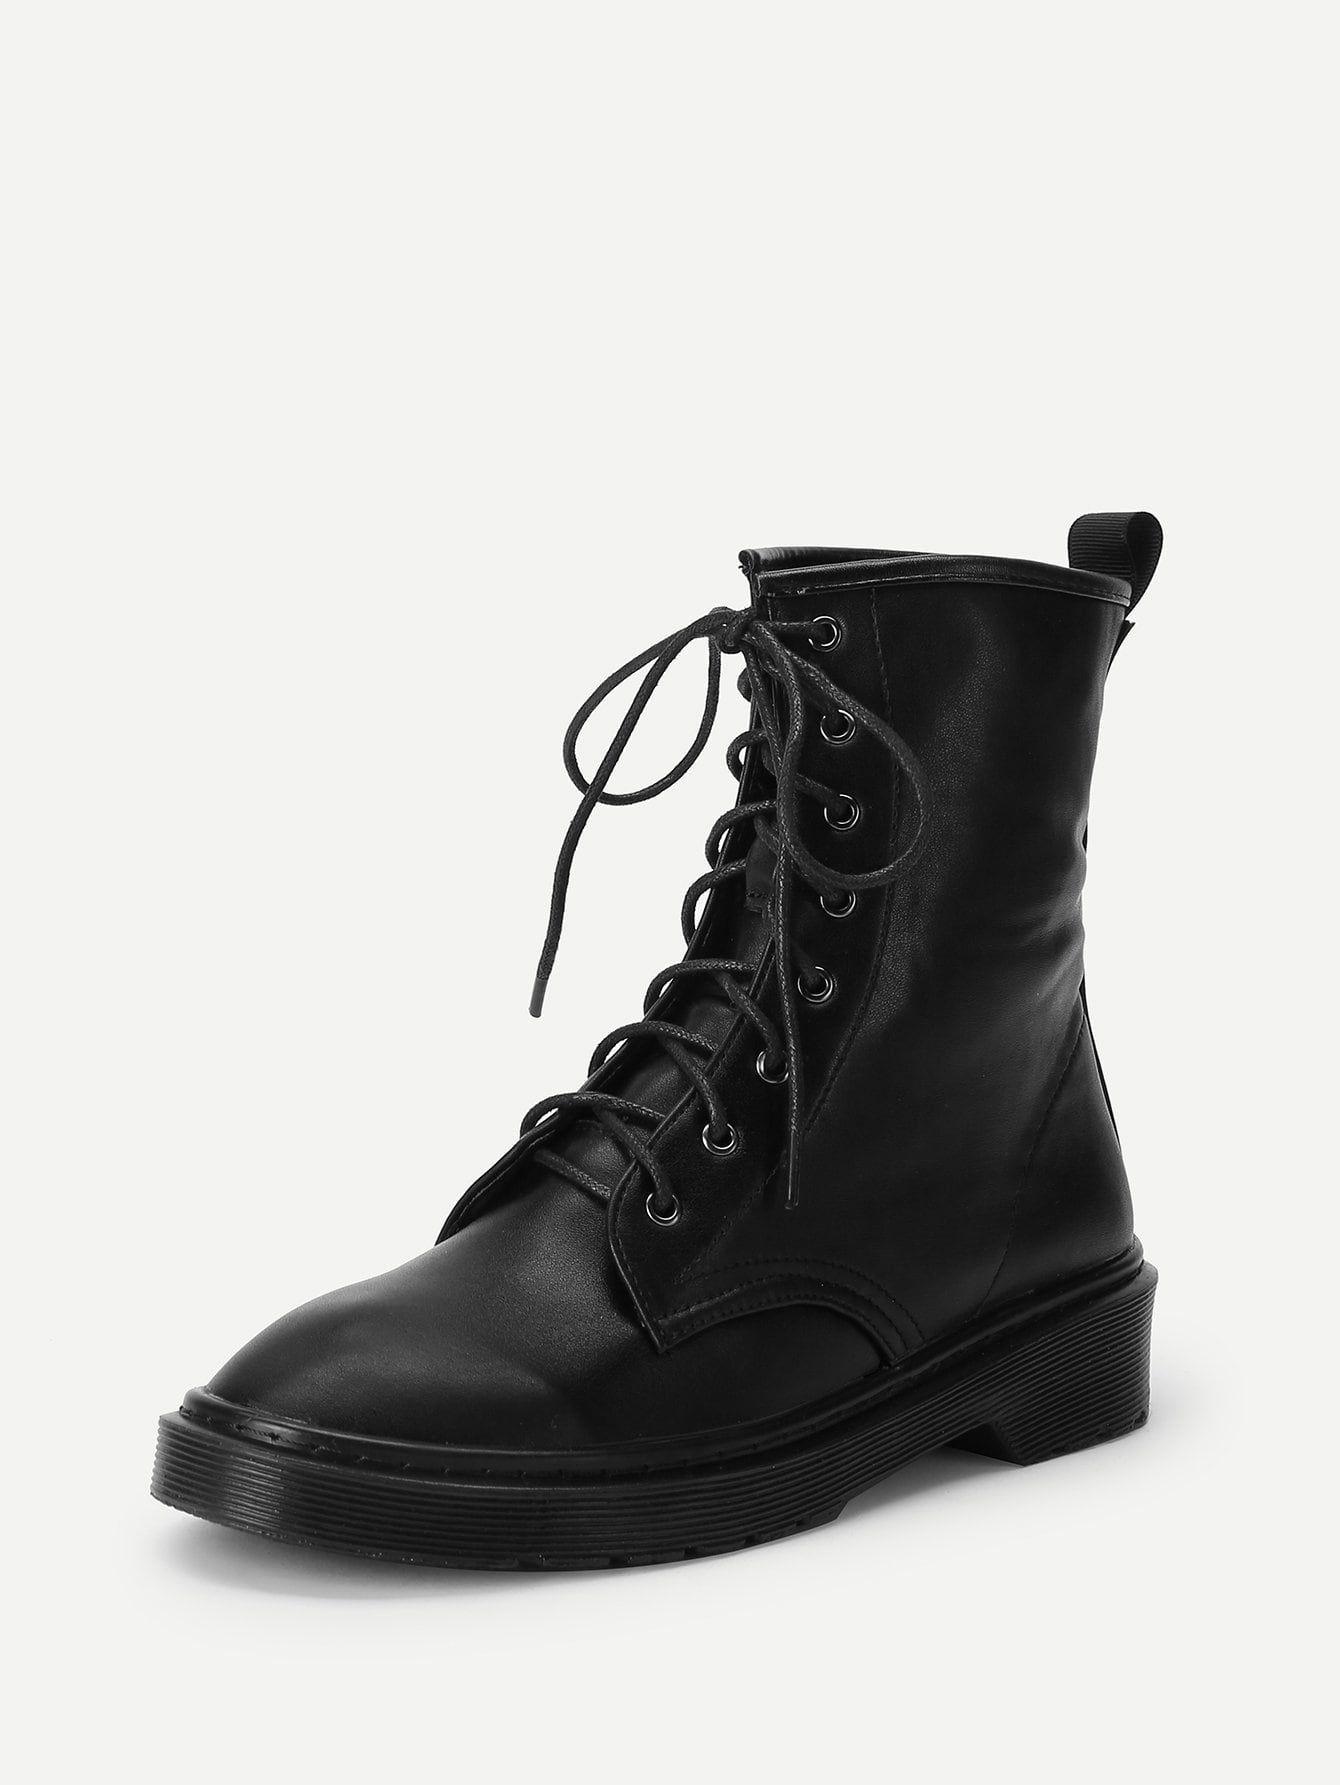 1854cfa2f3 Casual Almond Toe Short No zipper Black Lace-Up Plain Boots | Shoe ...